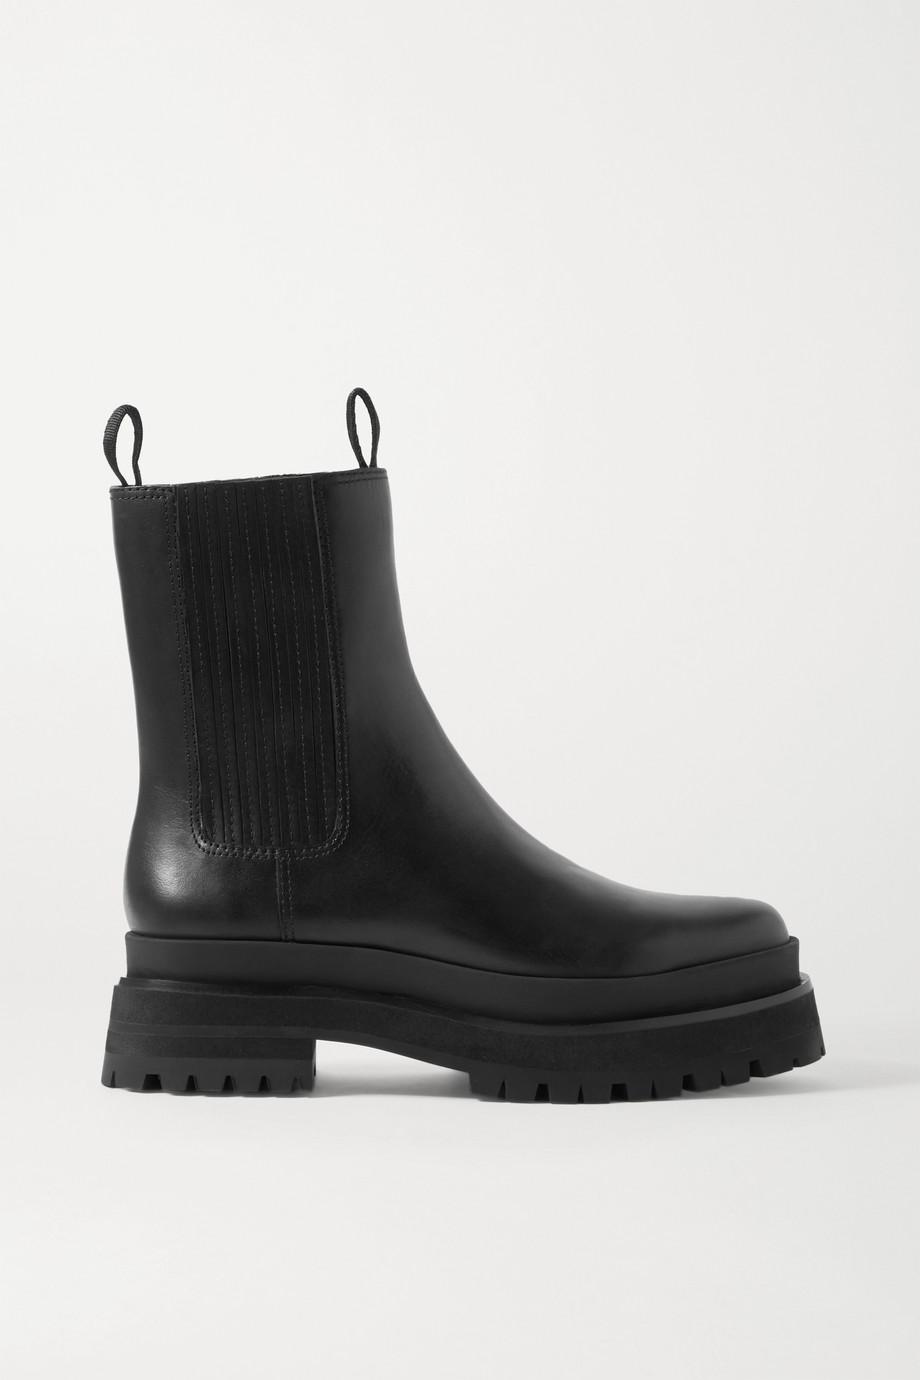 Loeffler Randall Toni leather Chelsea boots